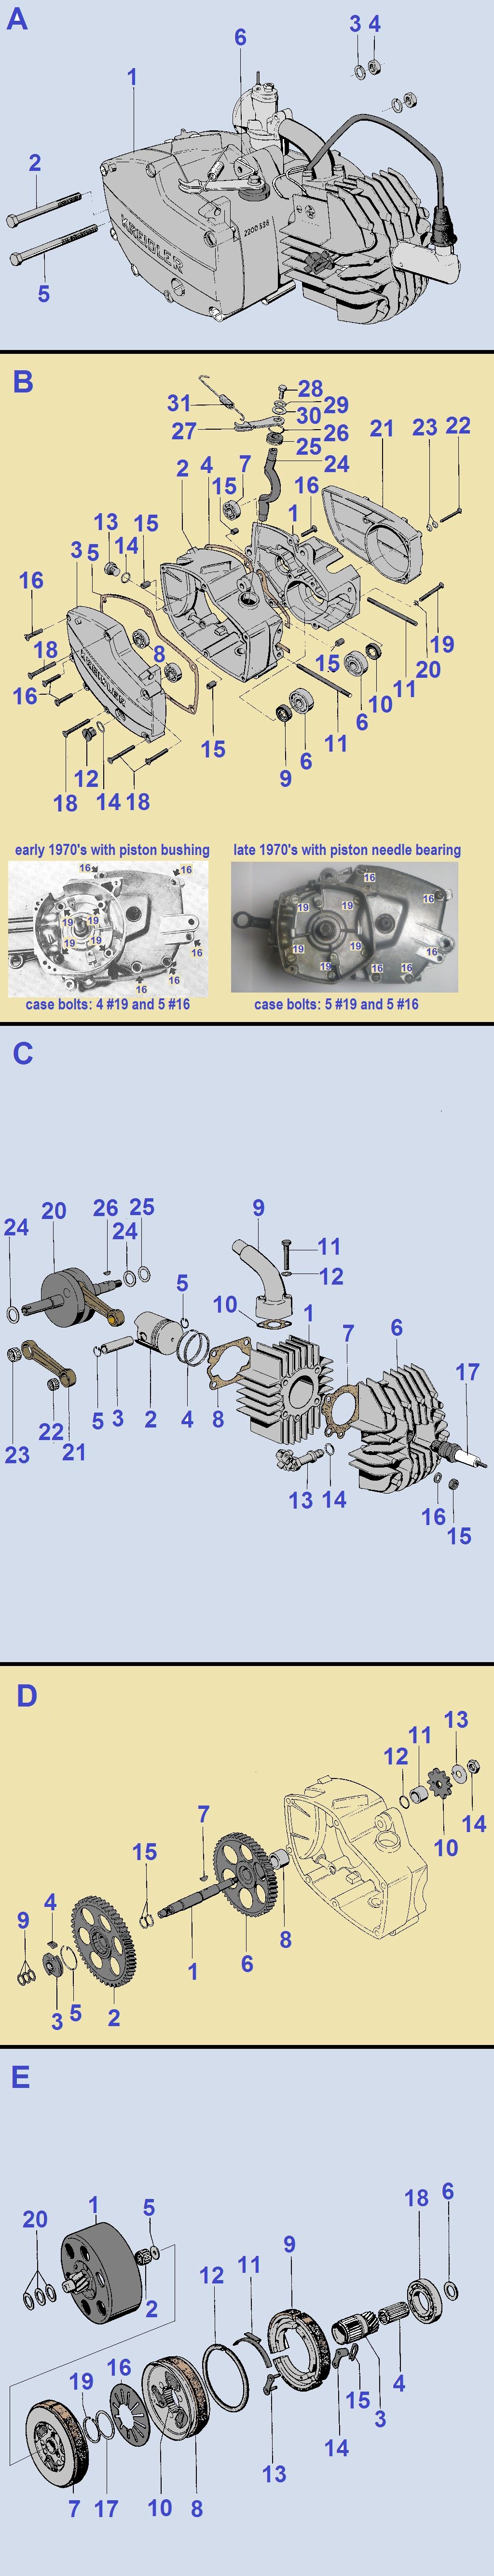 Honda Elite 80 Parts Diagram My Wiring Myrons Mopeds Of